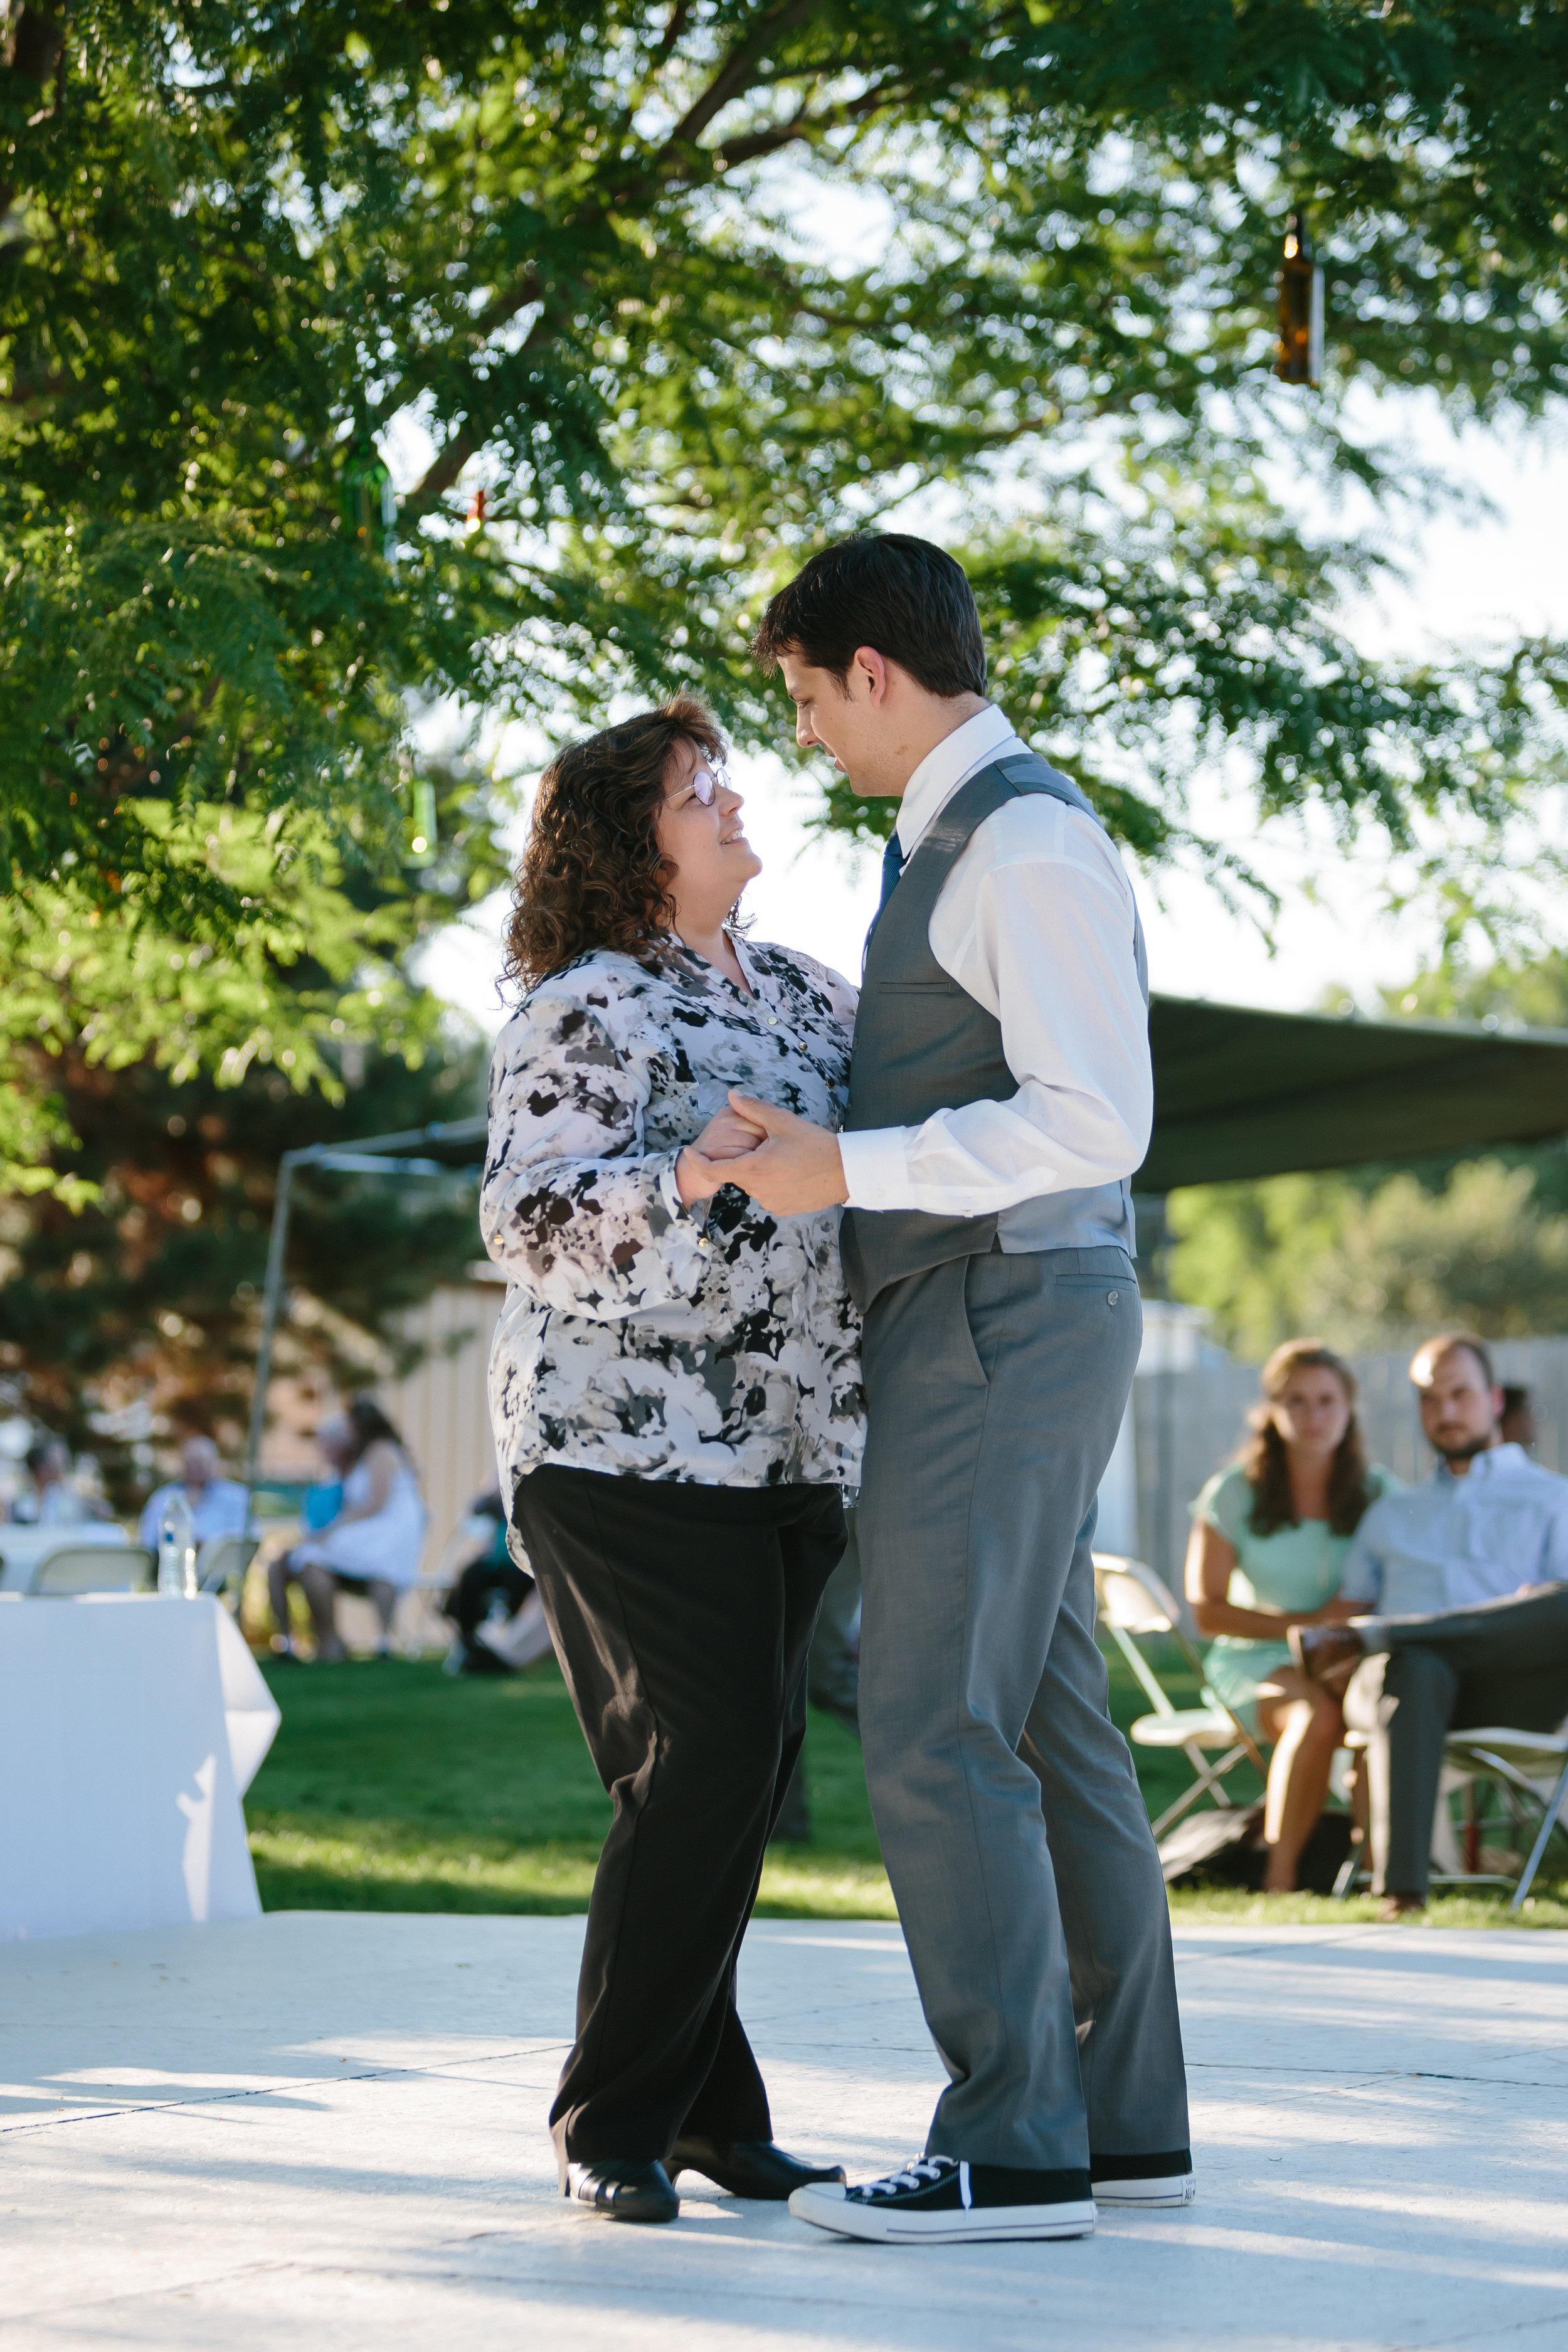 Jordan & Shantel Married - Idaho - Corrie Mick Photography-307.jpg